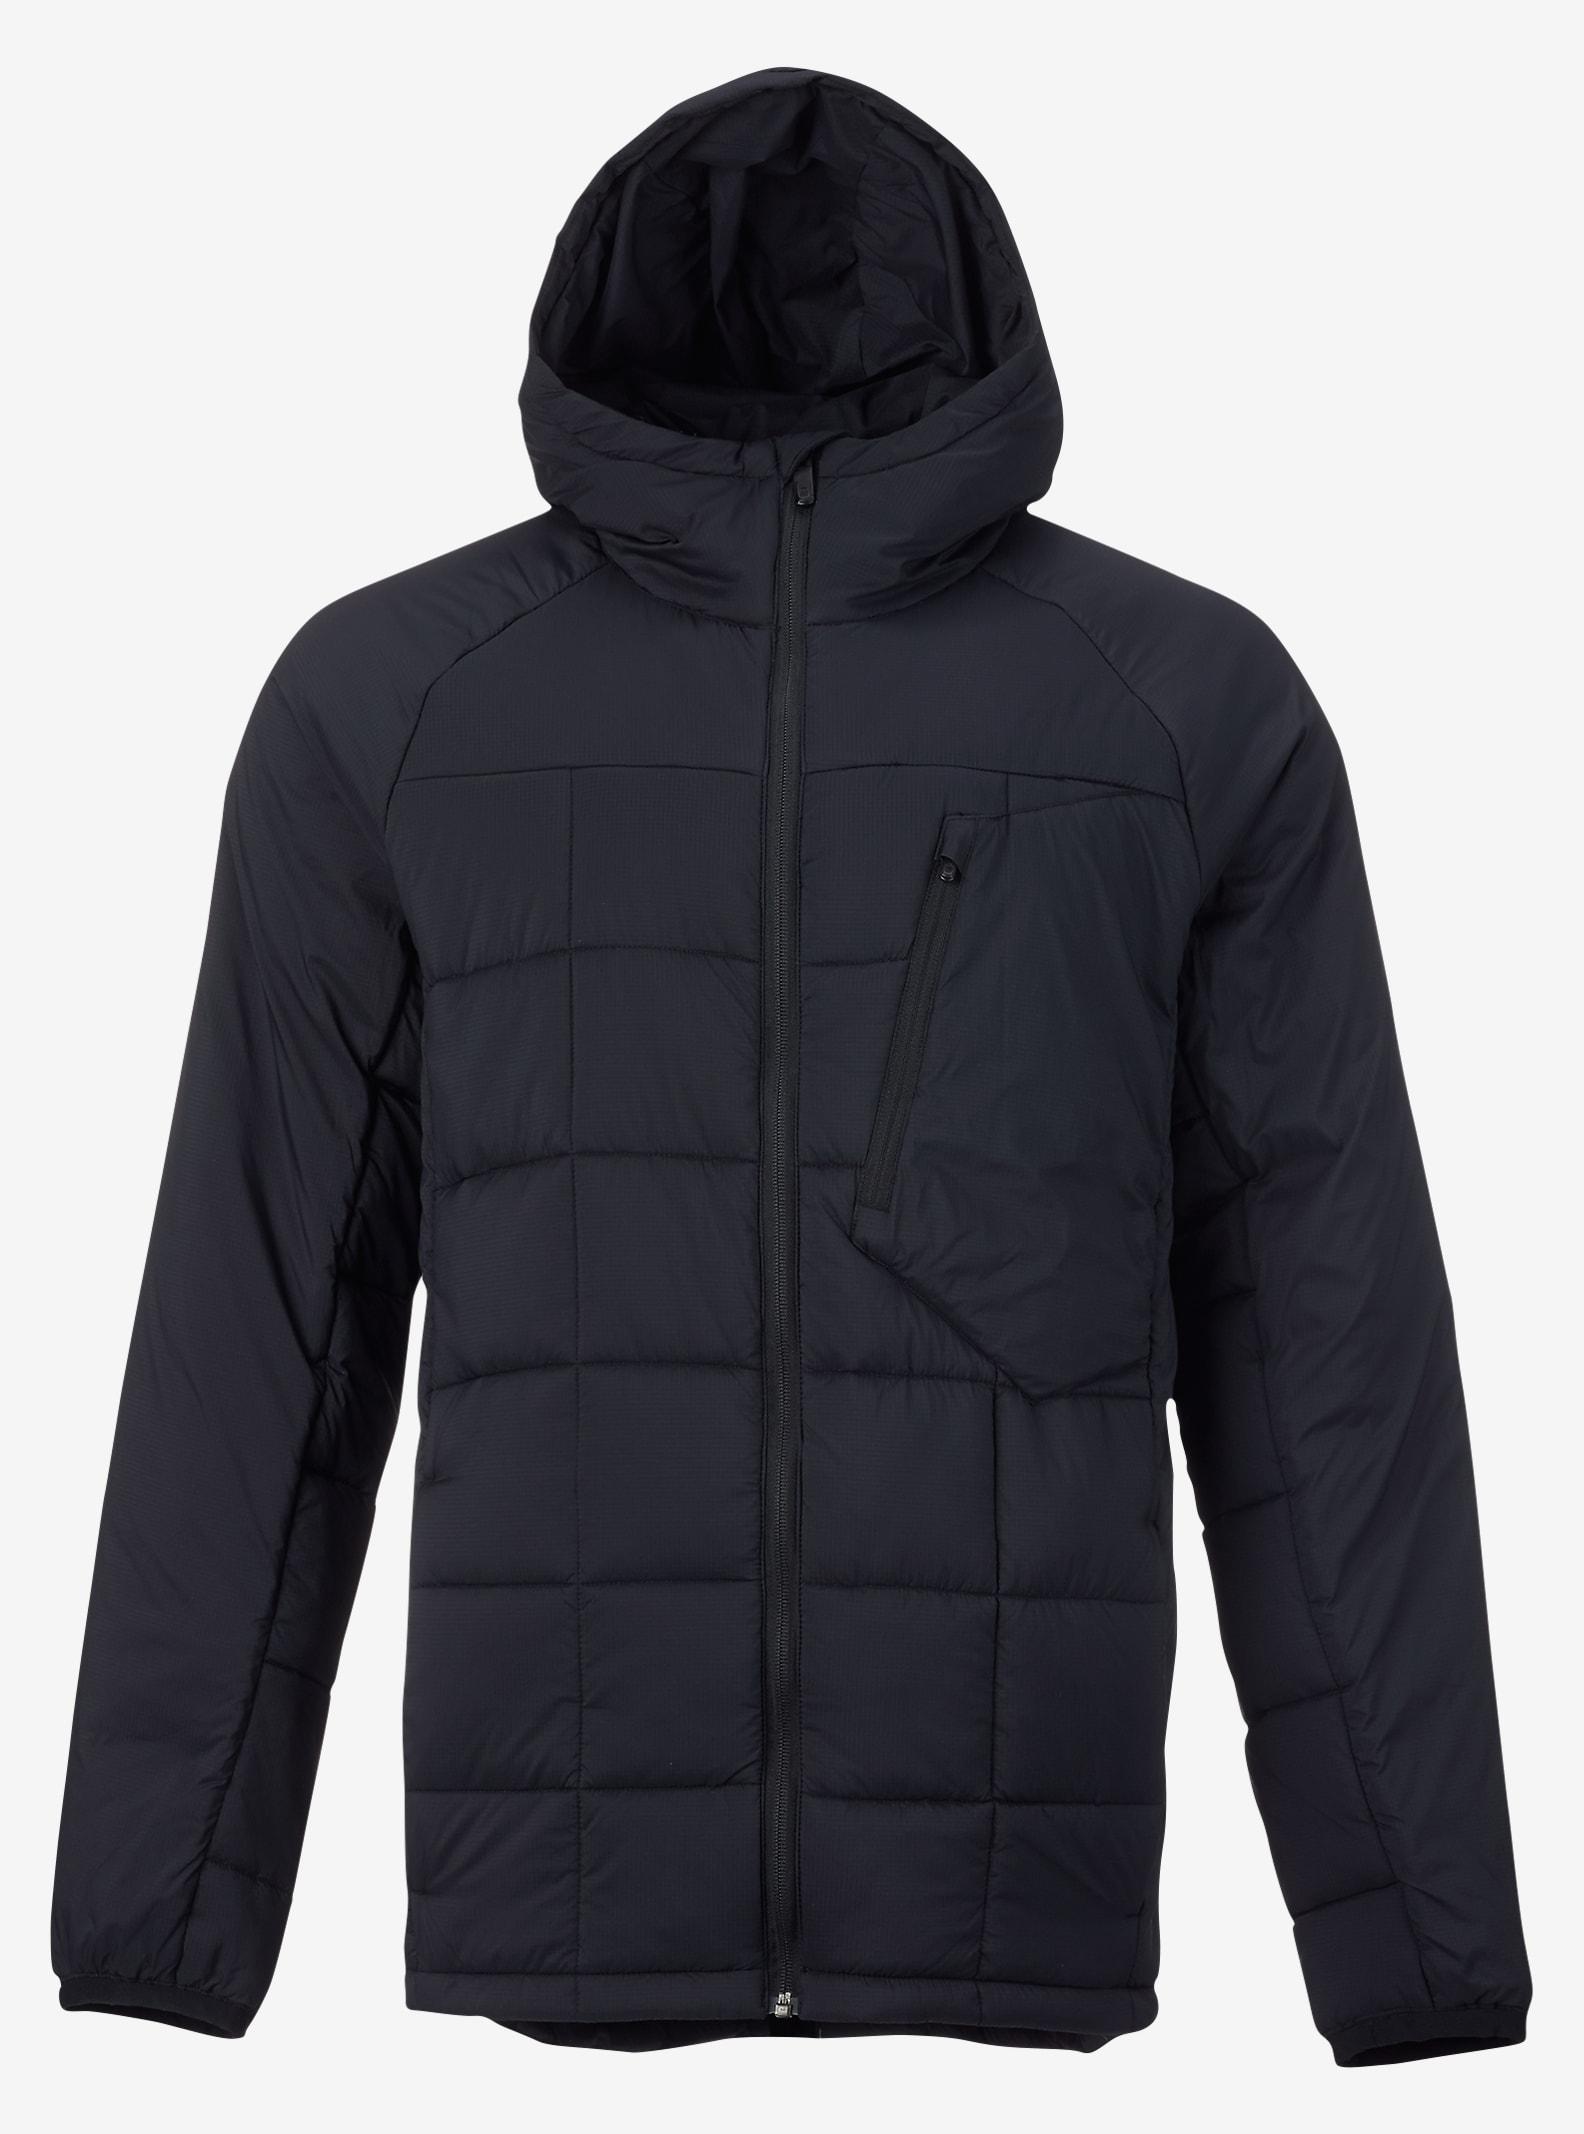 Burton [ak] NH Insulator Jacket shown in True Black